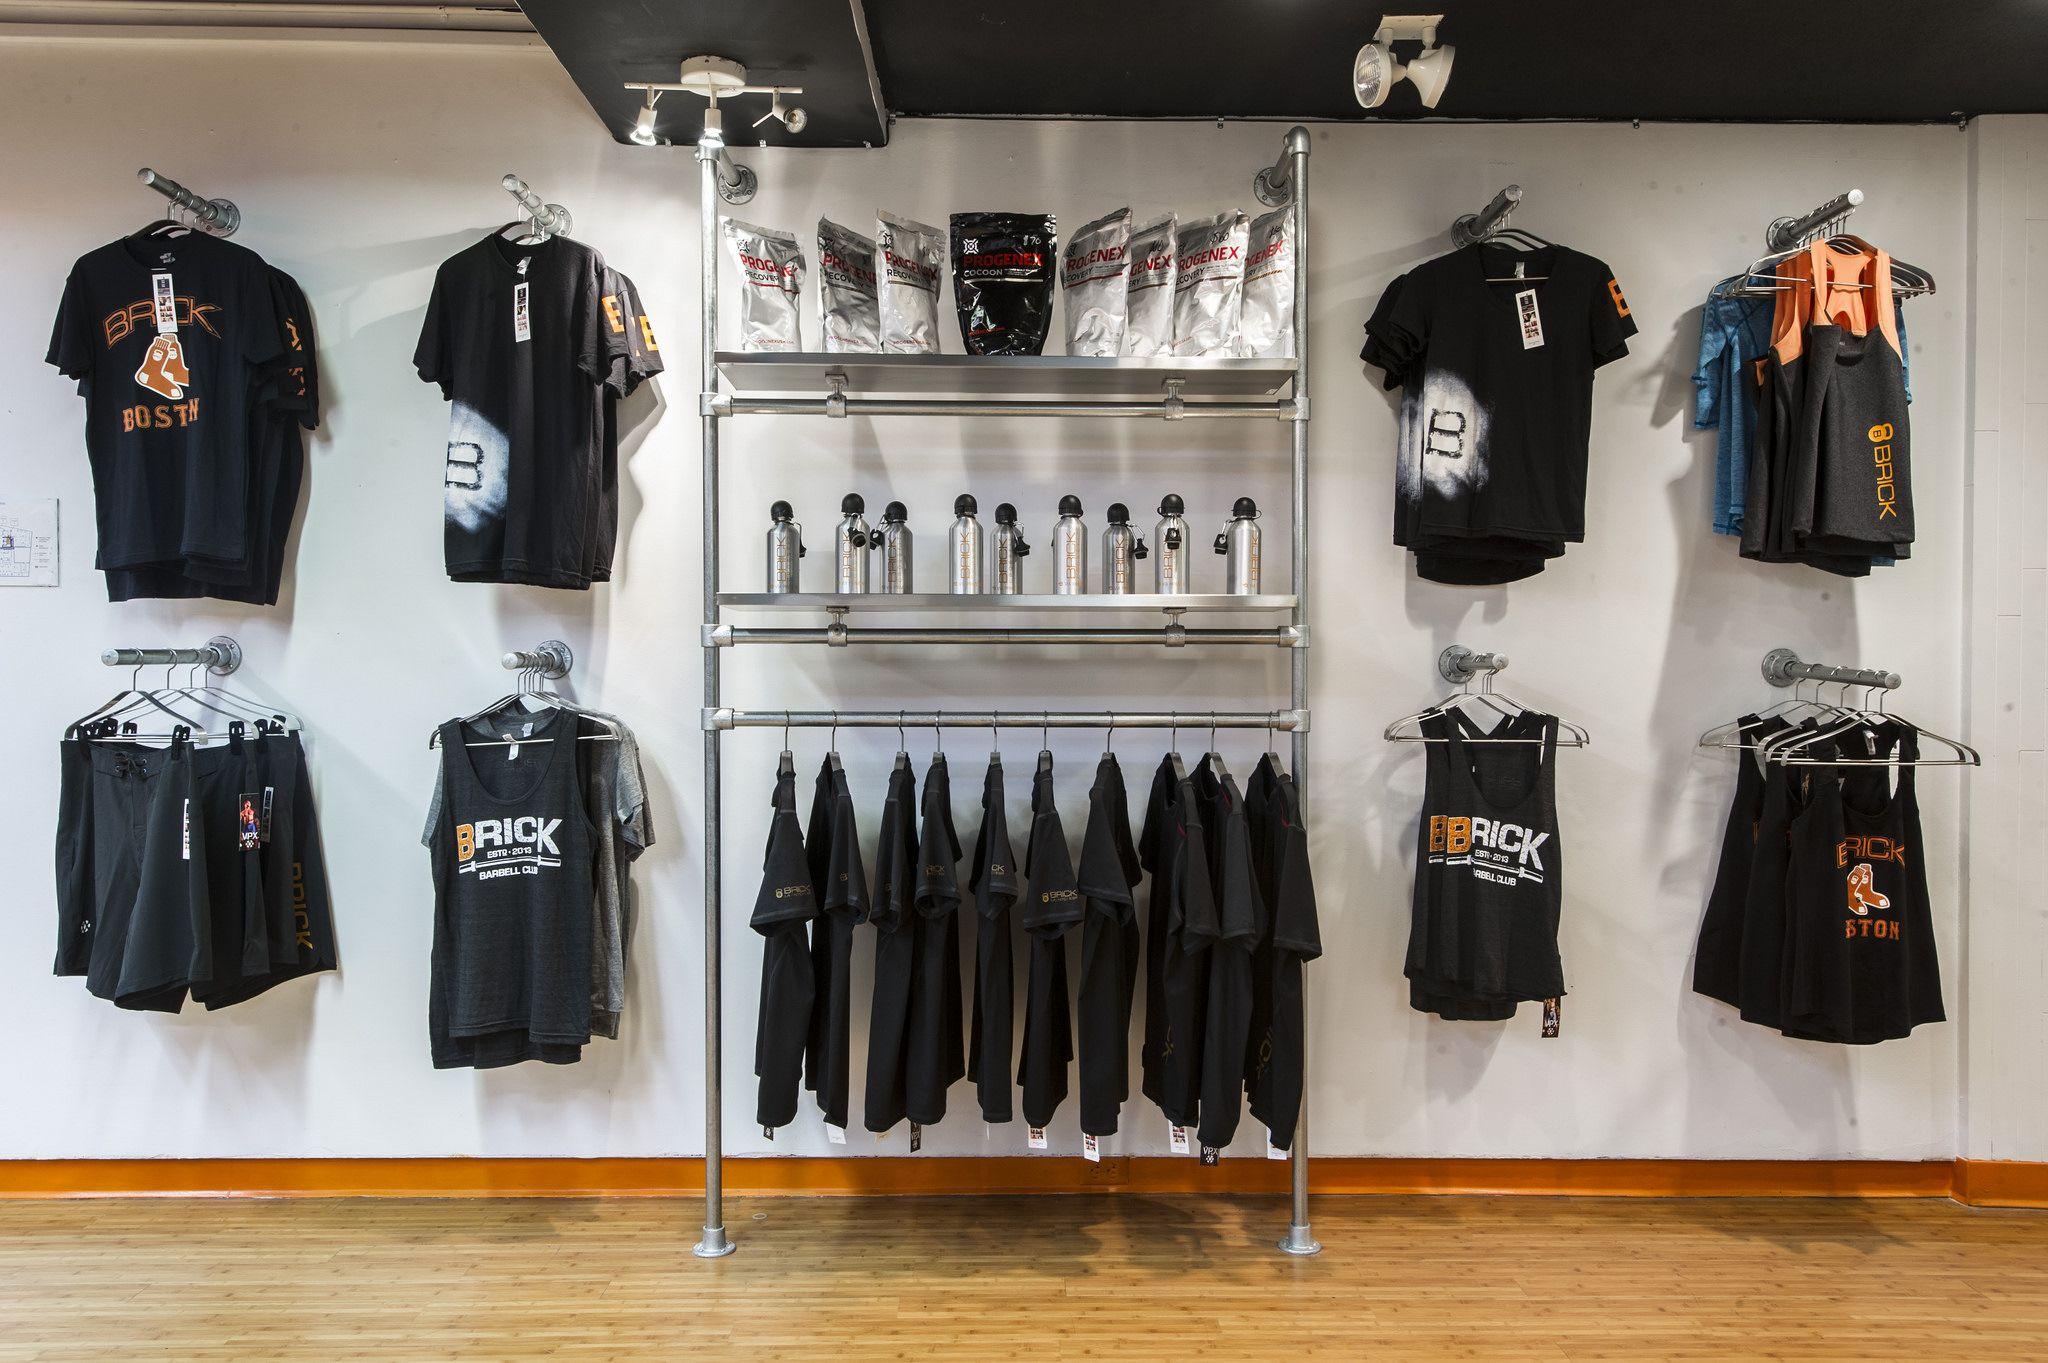 Commercial Clothing Racks Clothing Rack Retail Display Shop